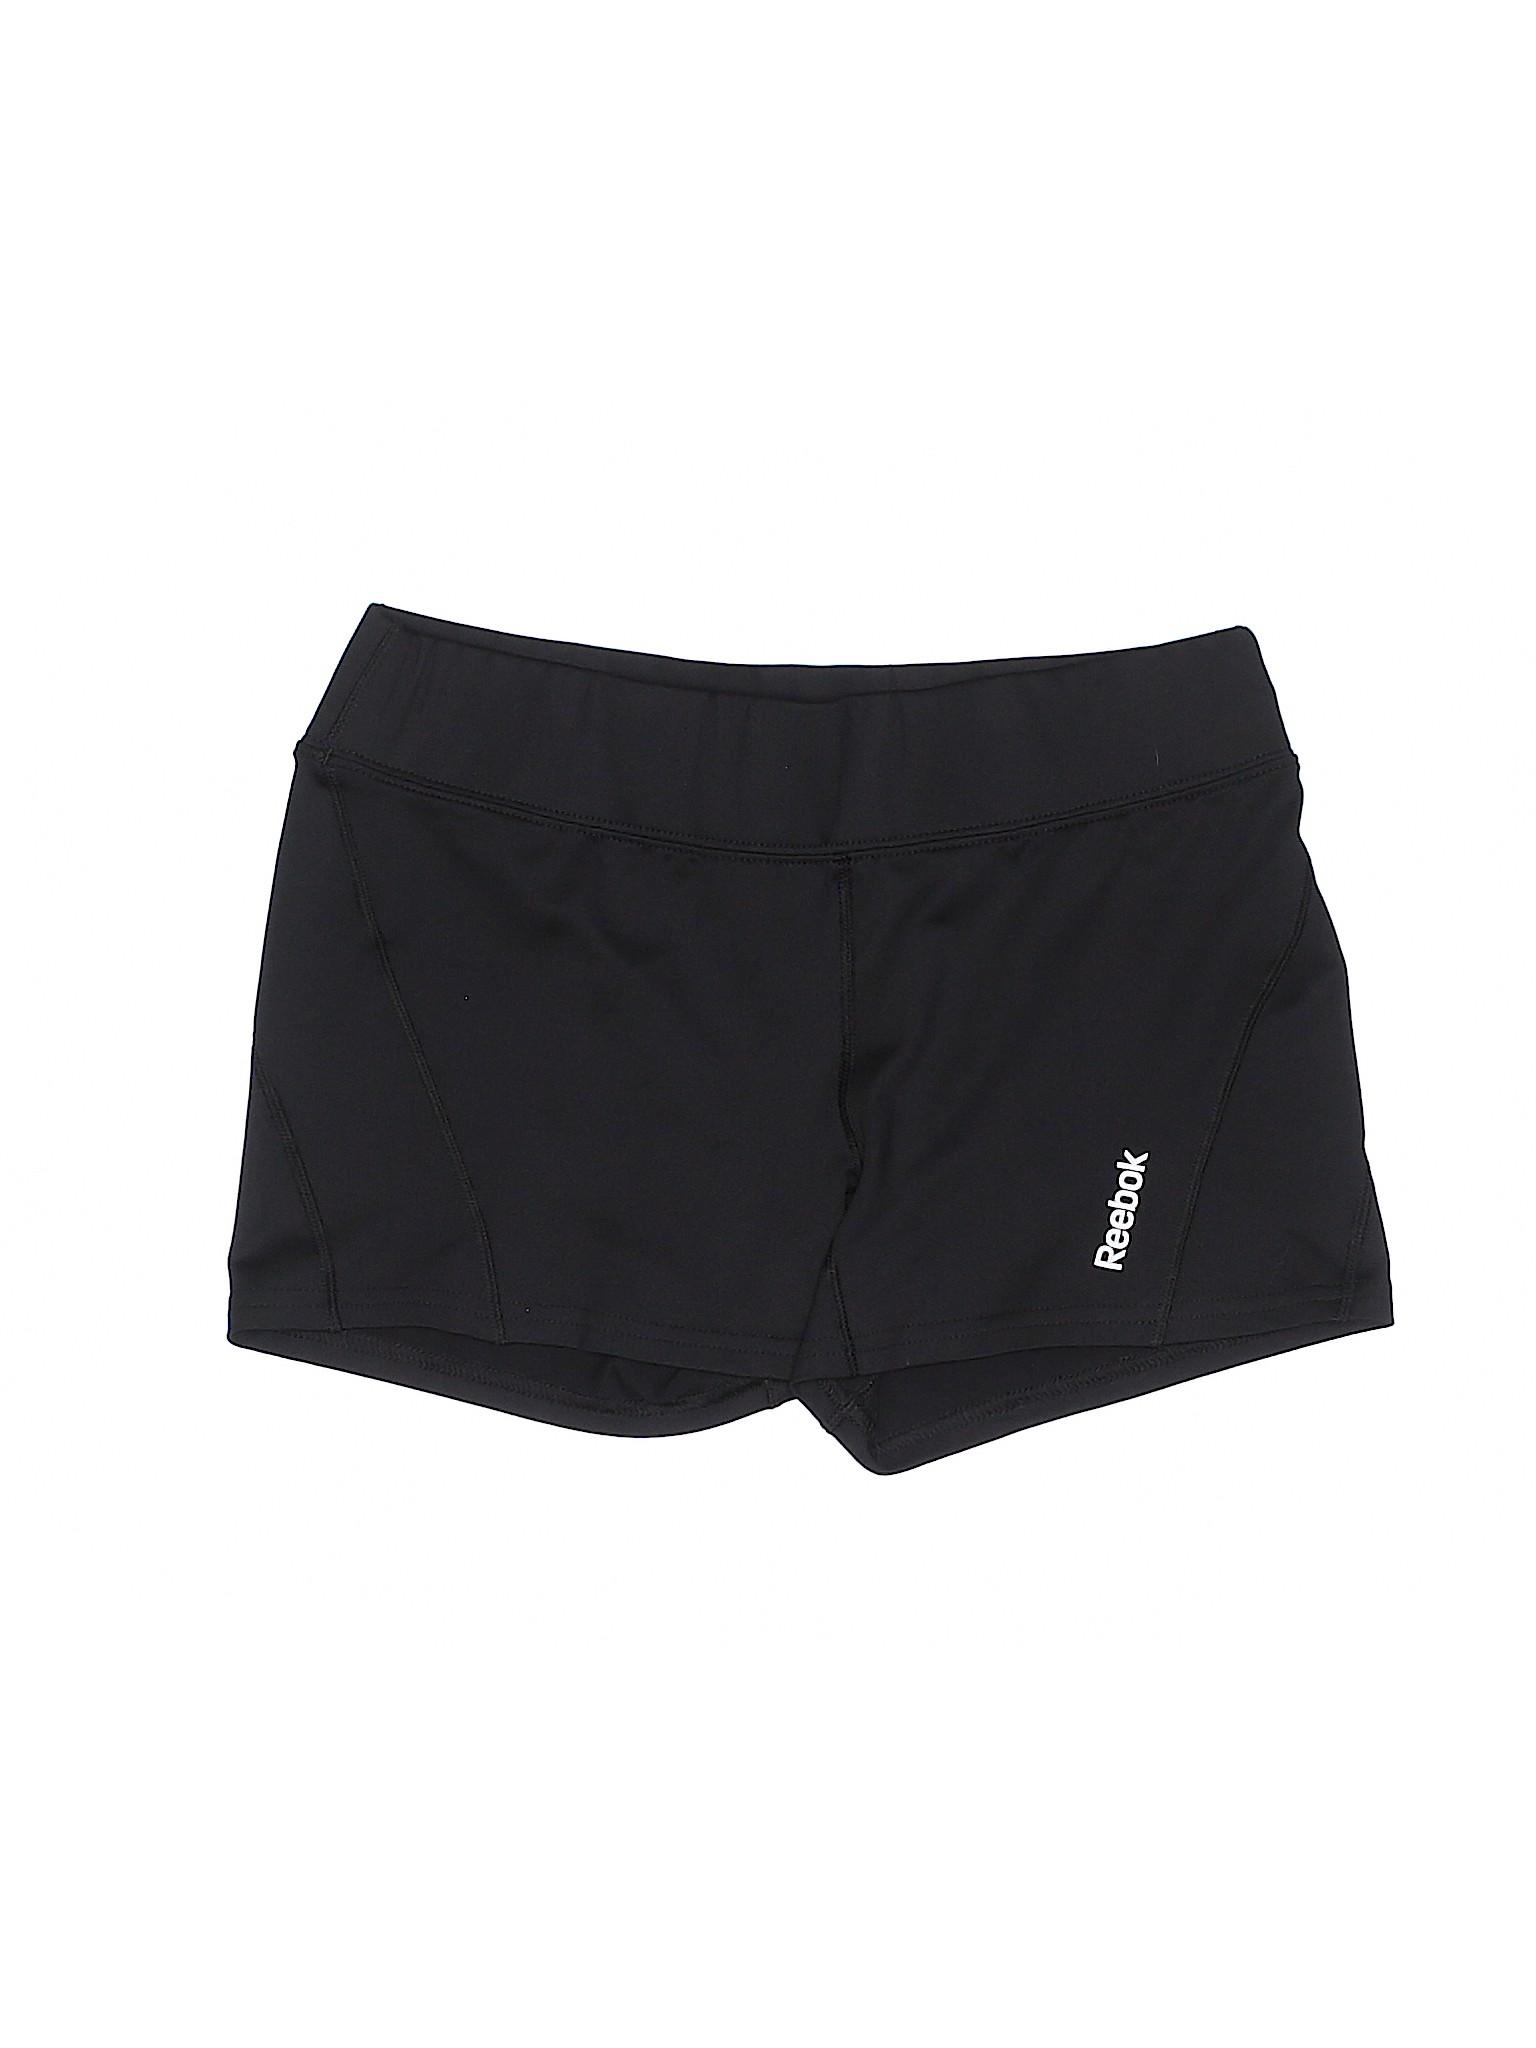 Boutique Reebok Athletic Shorts Boutique Boutique Reebok Reebok Boutique Athletic Athletic Shorts Shorts w6E7pvqB6